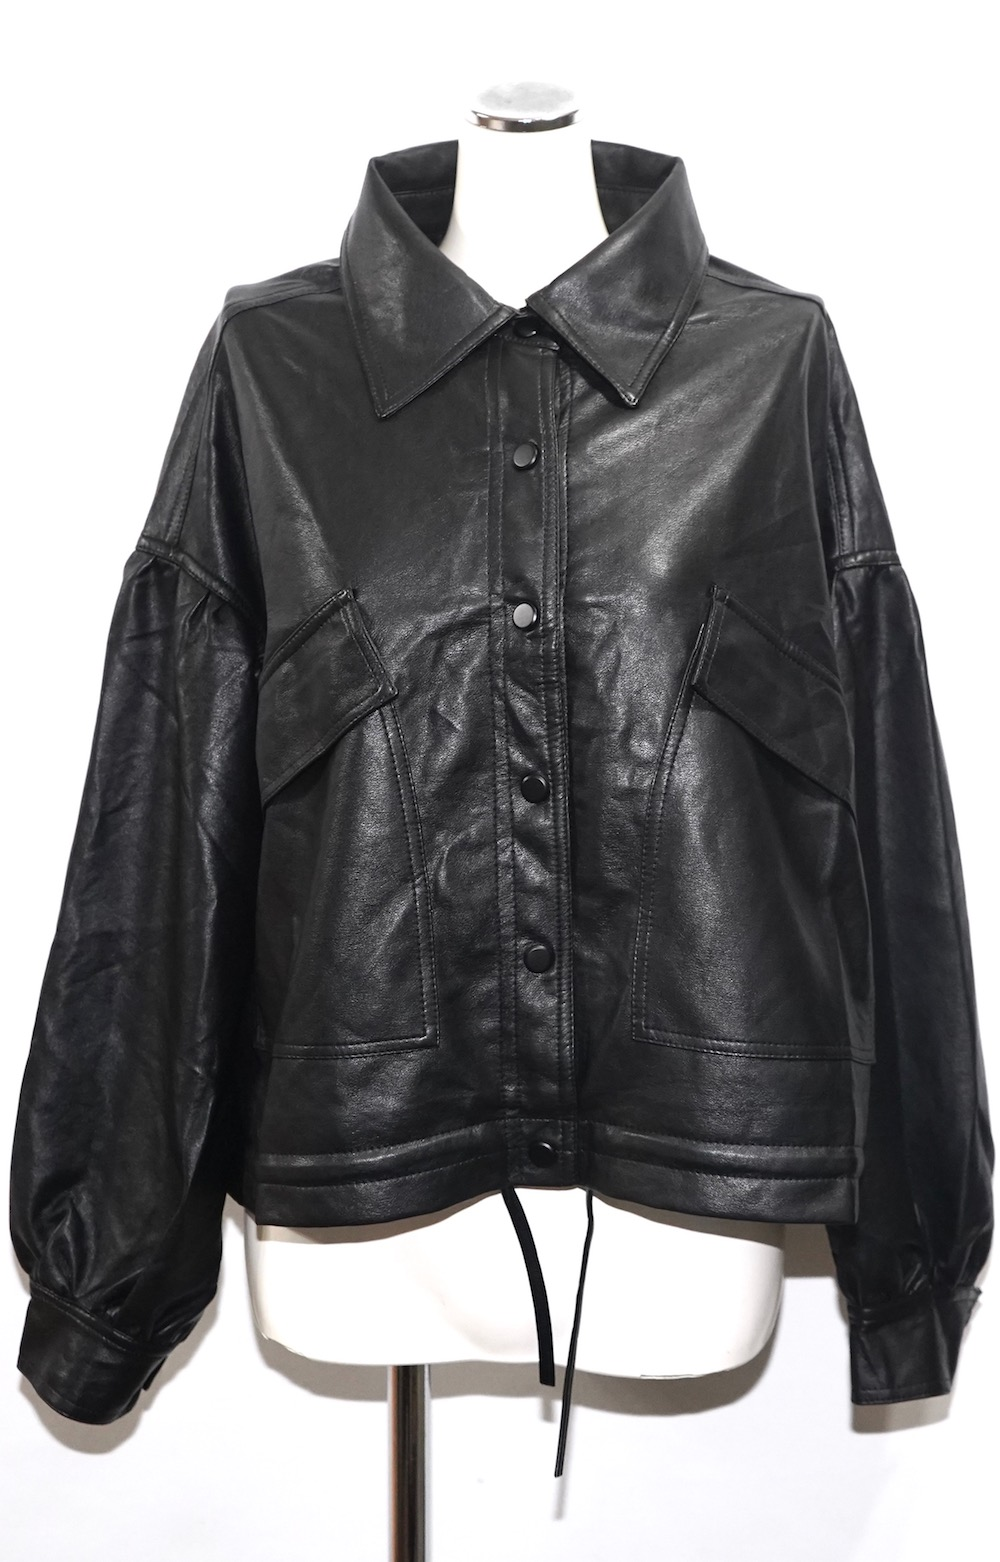 Balloon Sleeve Leather Touch Jacket Coat (black)